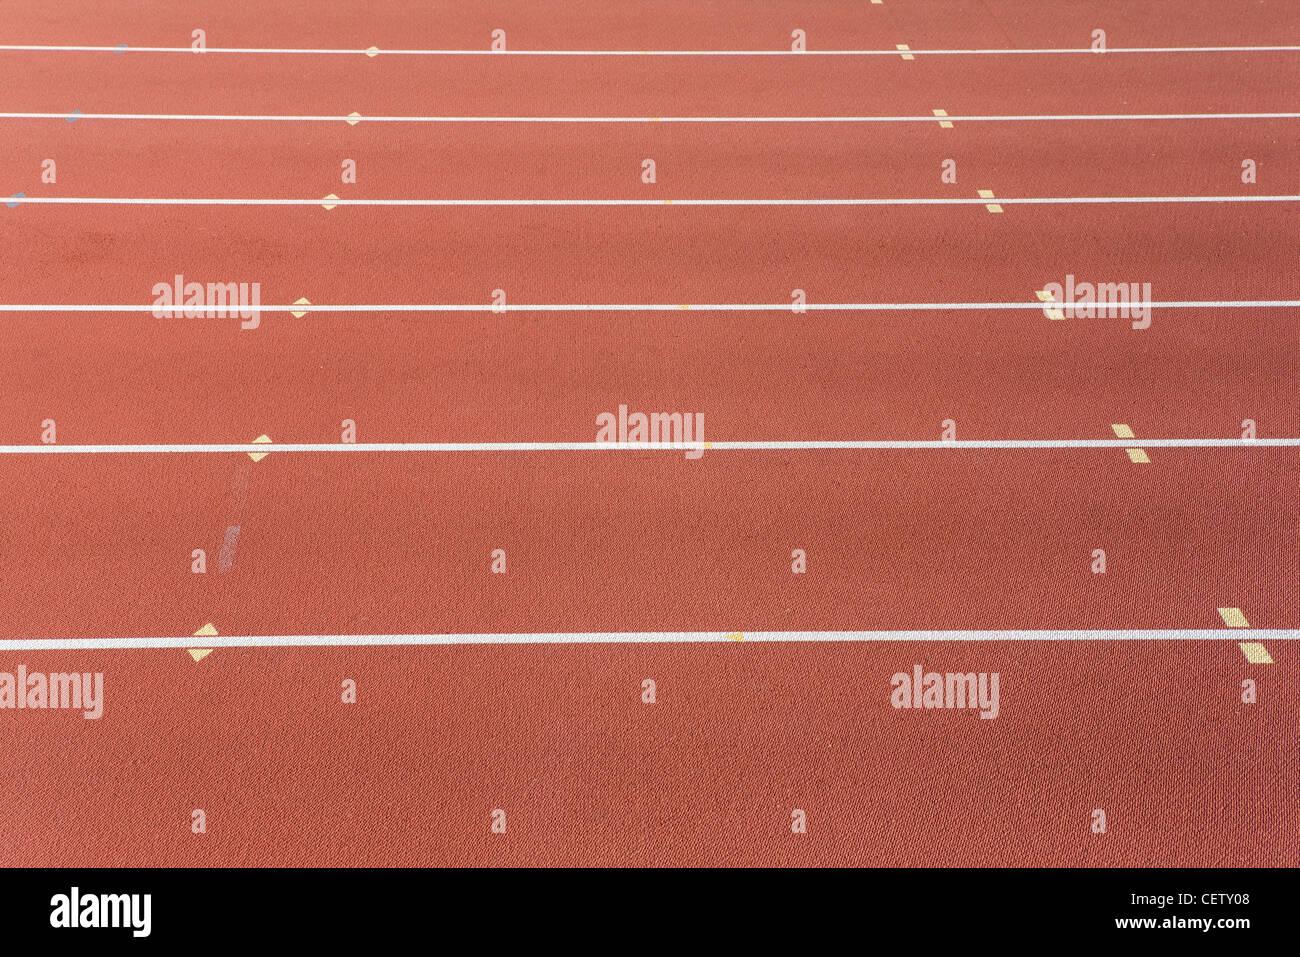 Carriles de la pista de atletismo Imagen De Stock